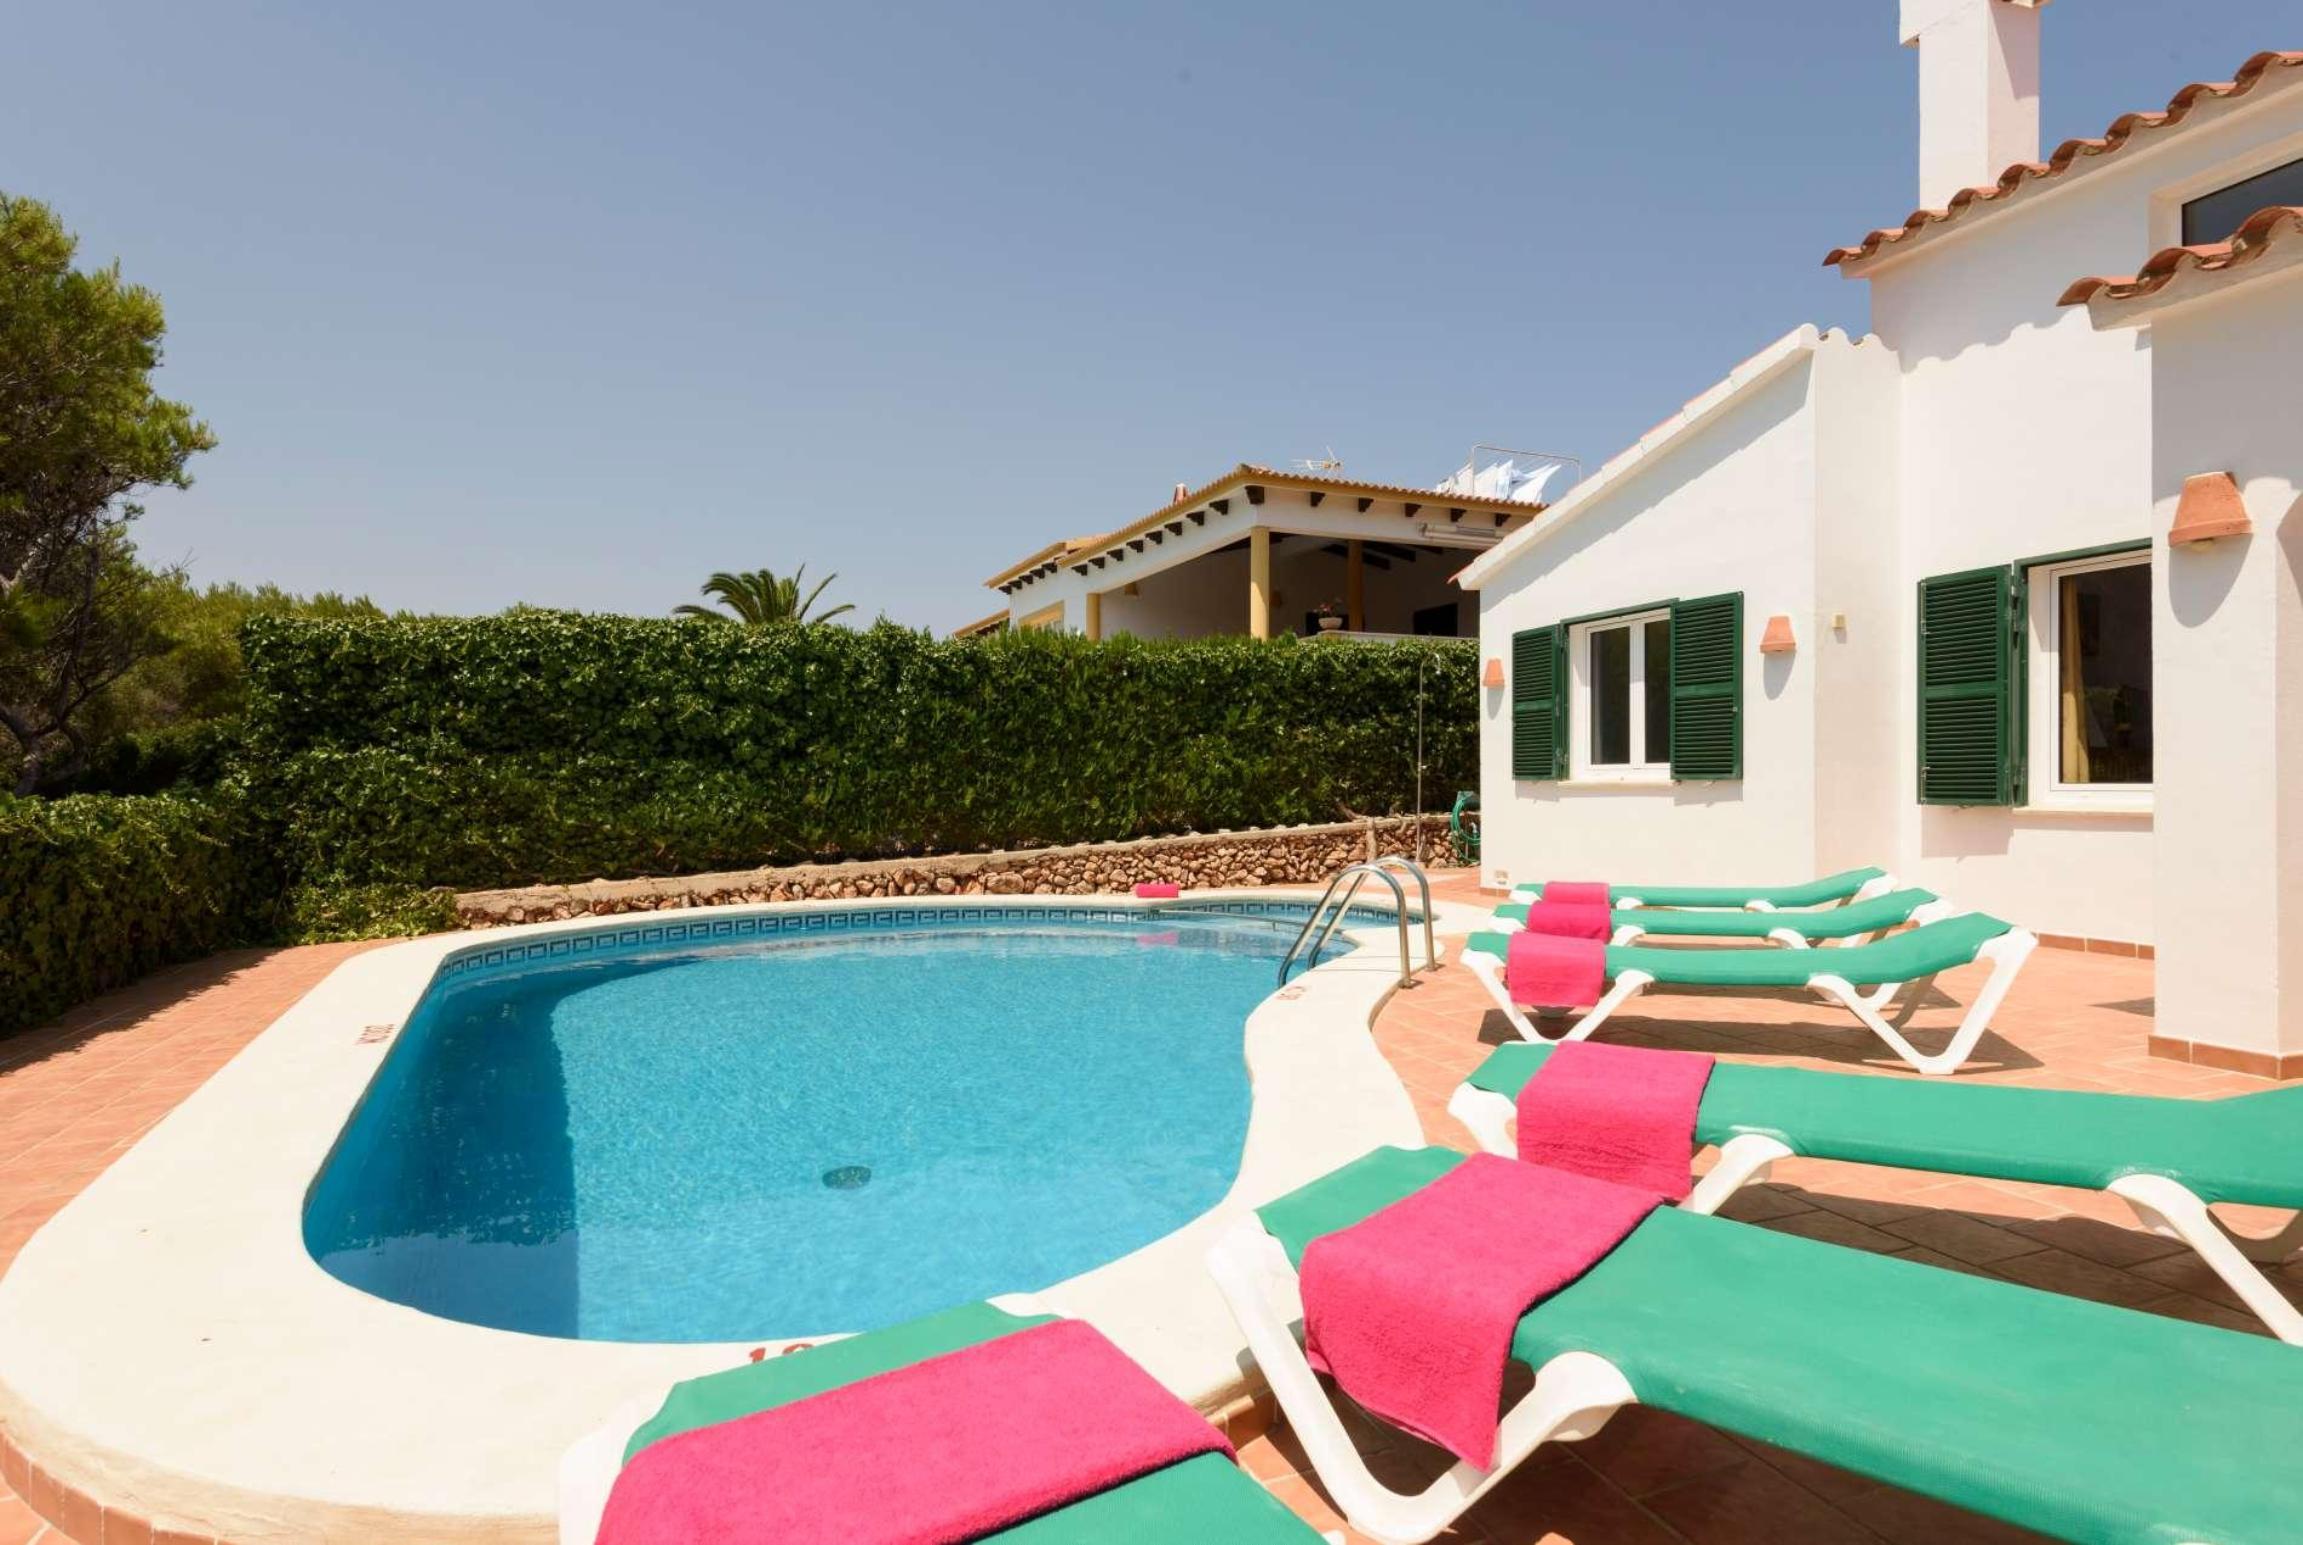 Ferienhaus Eulalia II (2653368), Arenal De'N Castell, Menorca, Balearische Inseln, Spanien, Bild 15